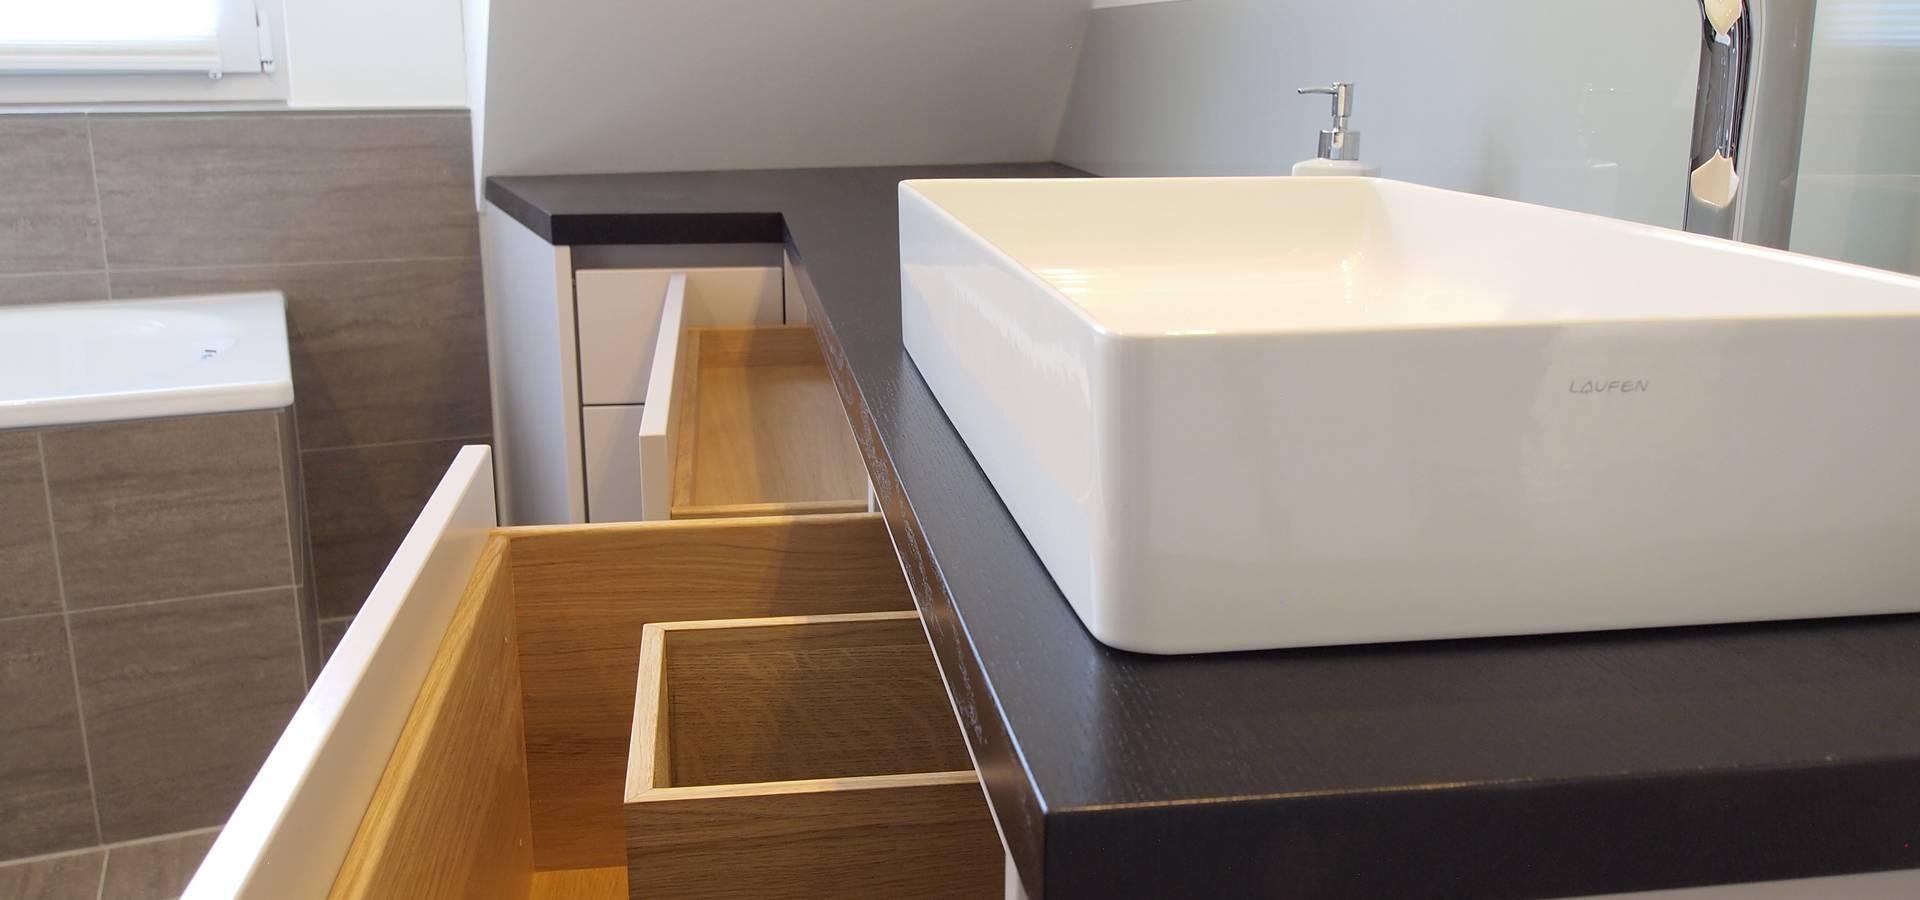 eugen a rother innenarchitekten in aachen homify. Black Bedroom Furniture Sets. Home Design Ideas